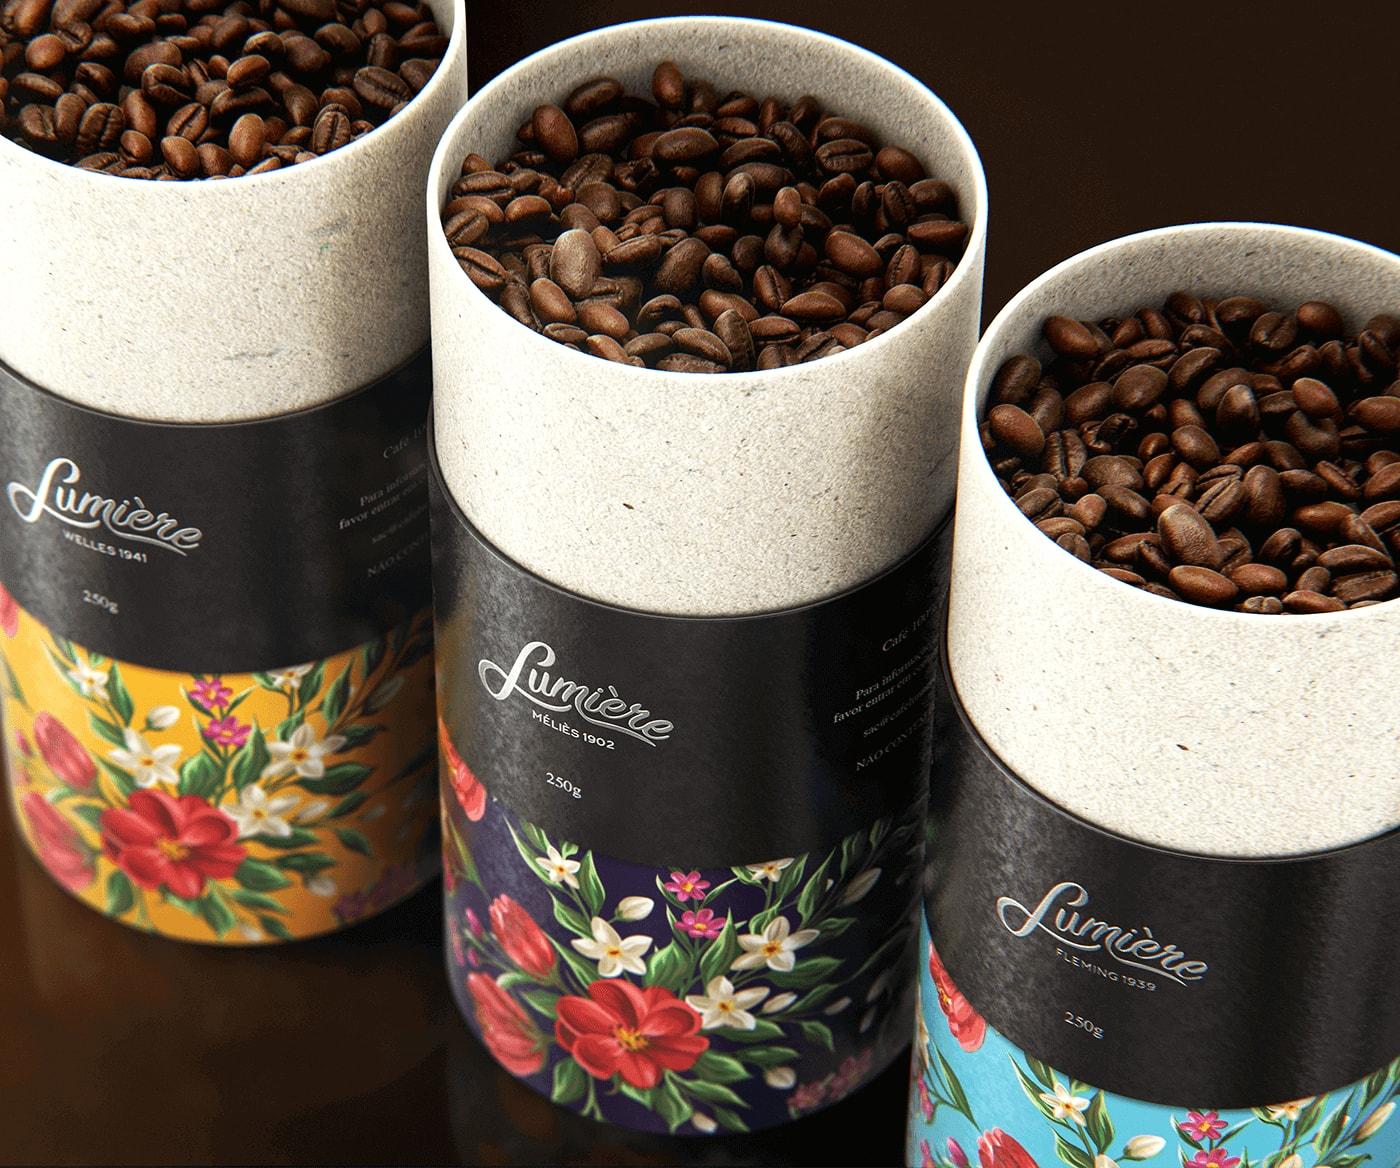 Lucas Gregorio – Lumière Coffee Experience